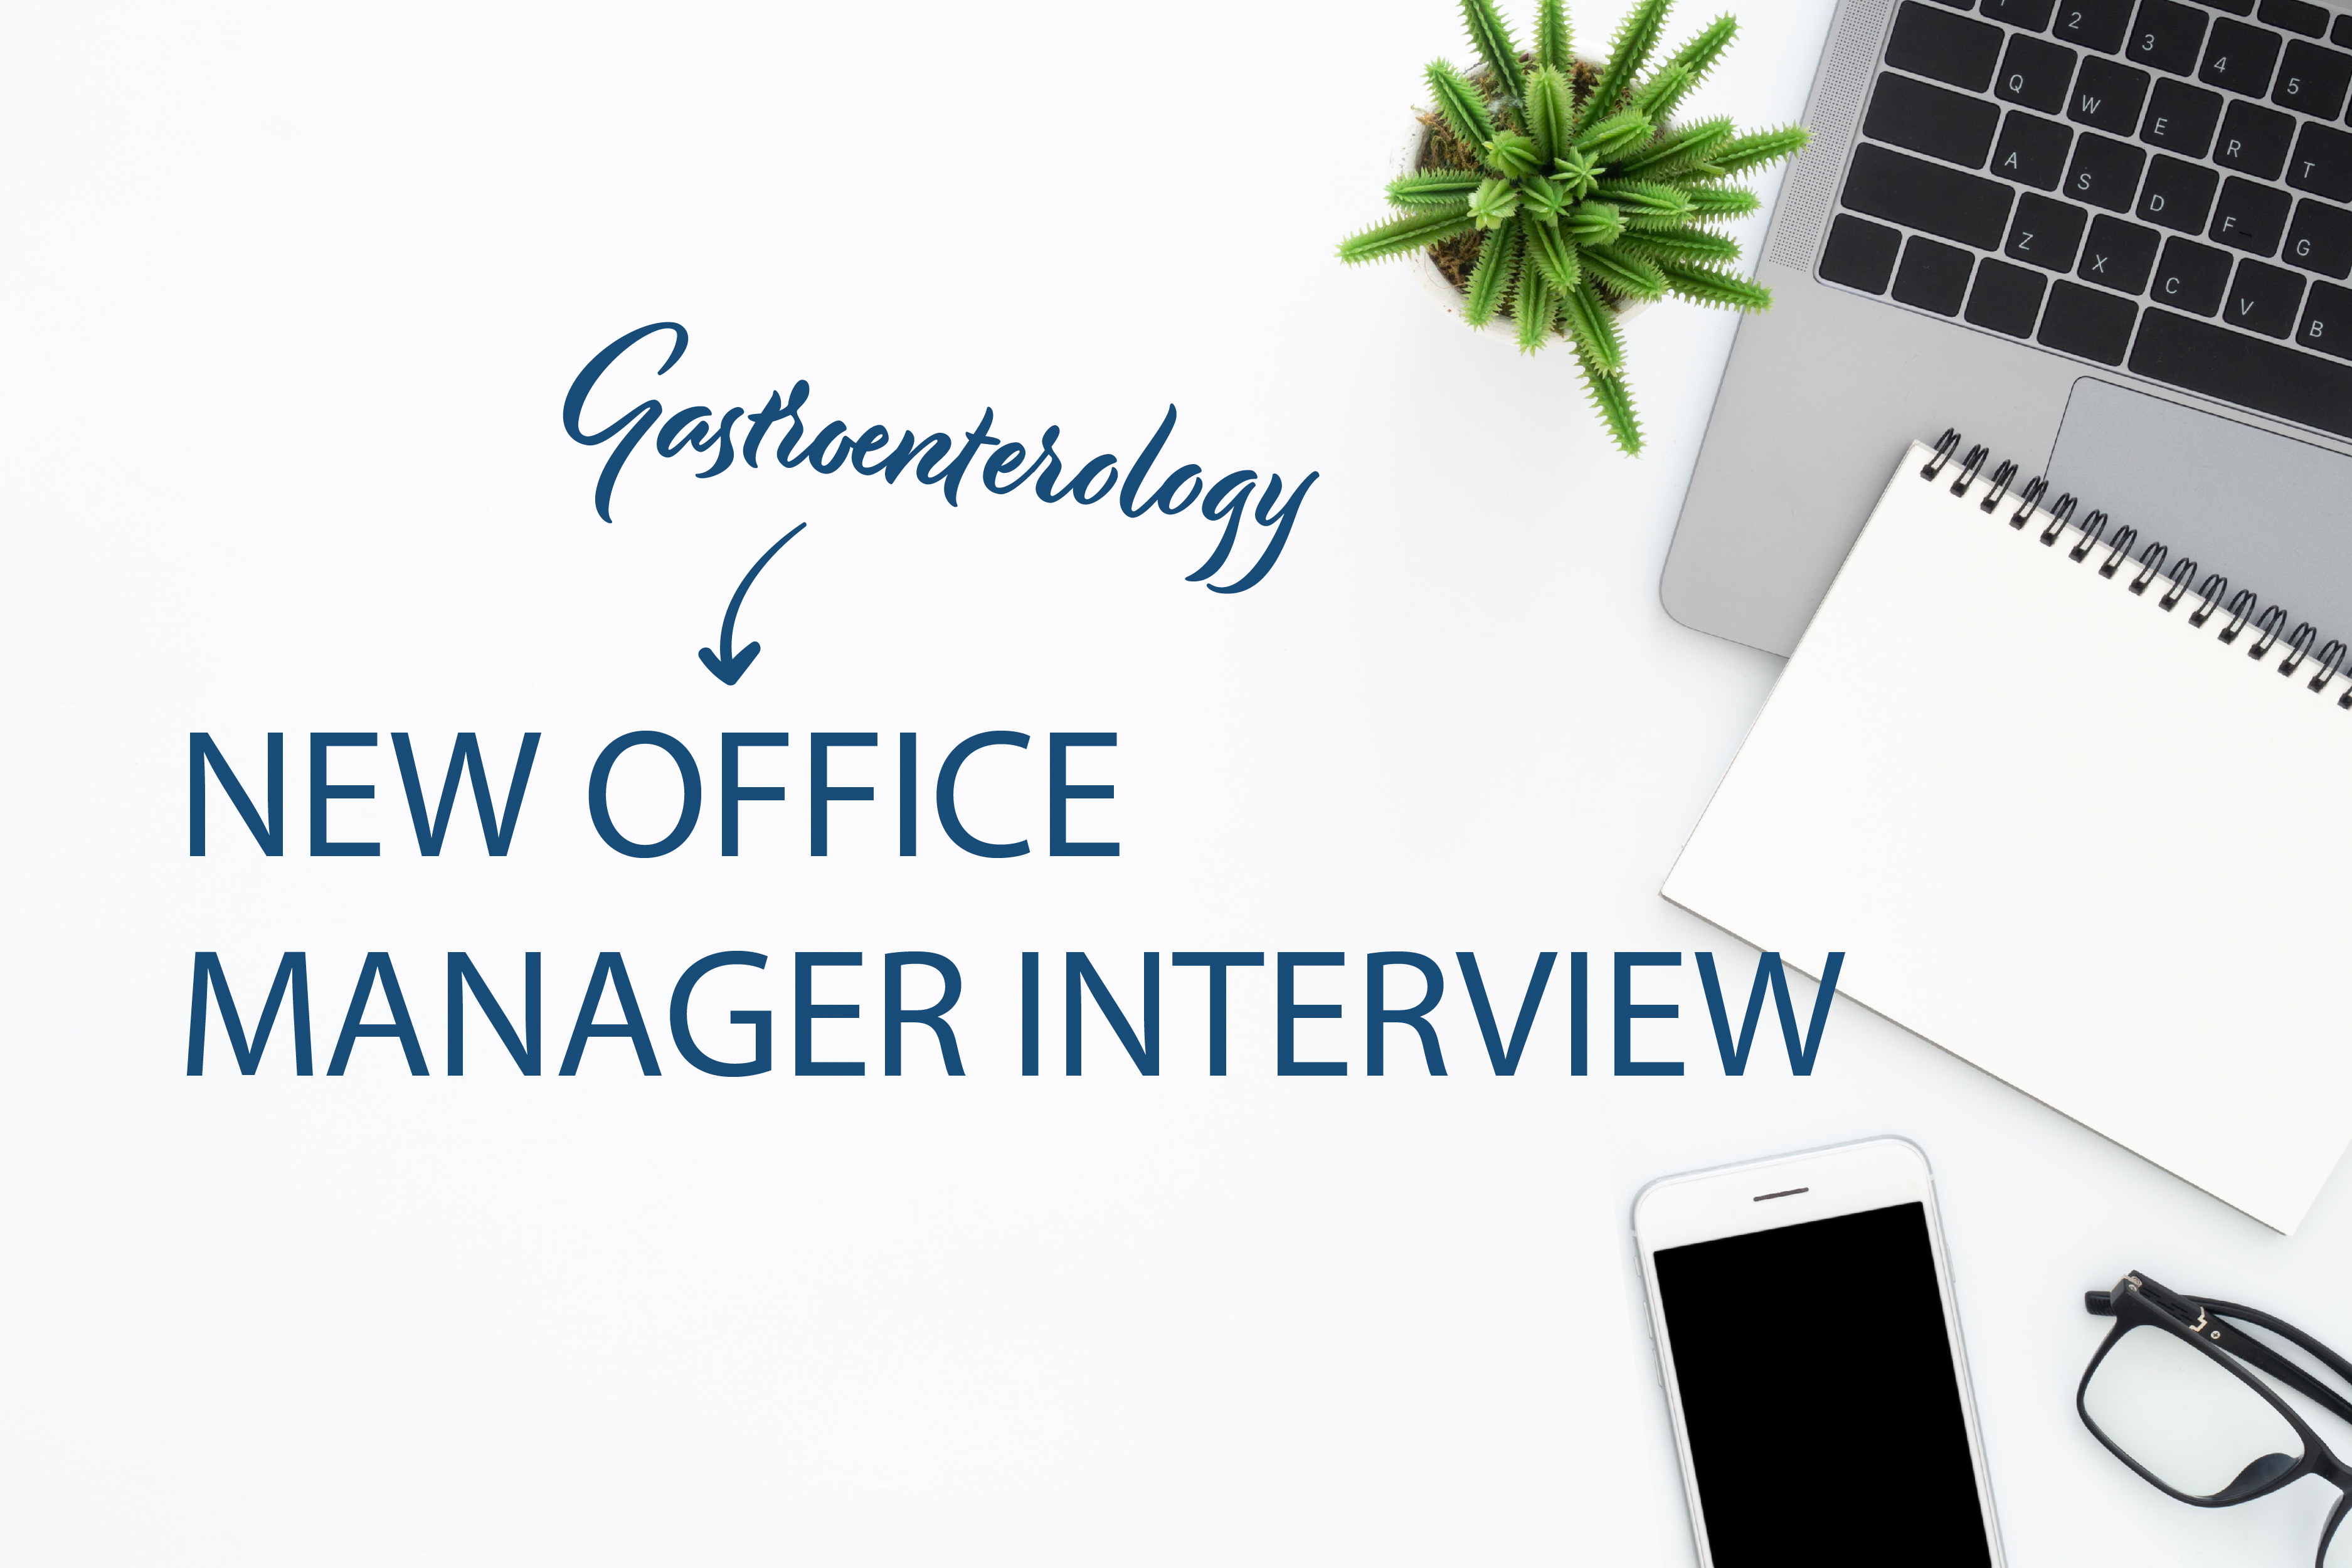 Gastroenterology Manager Interview